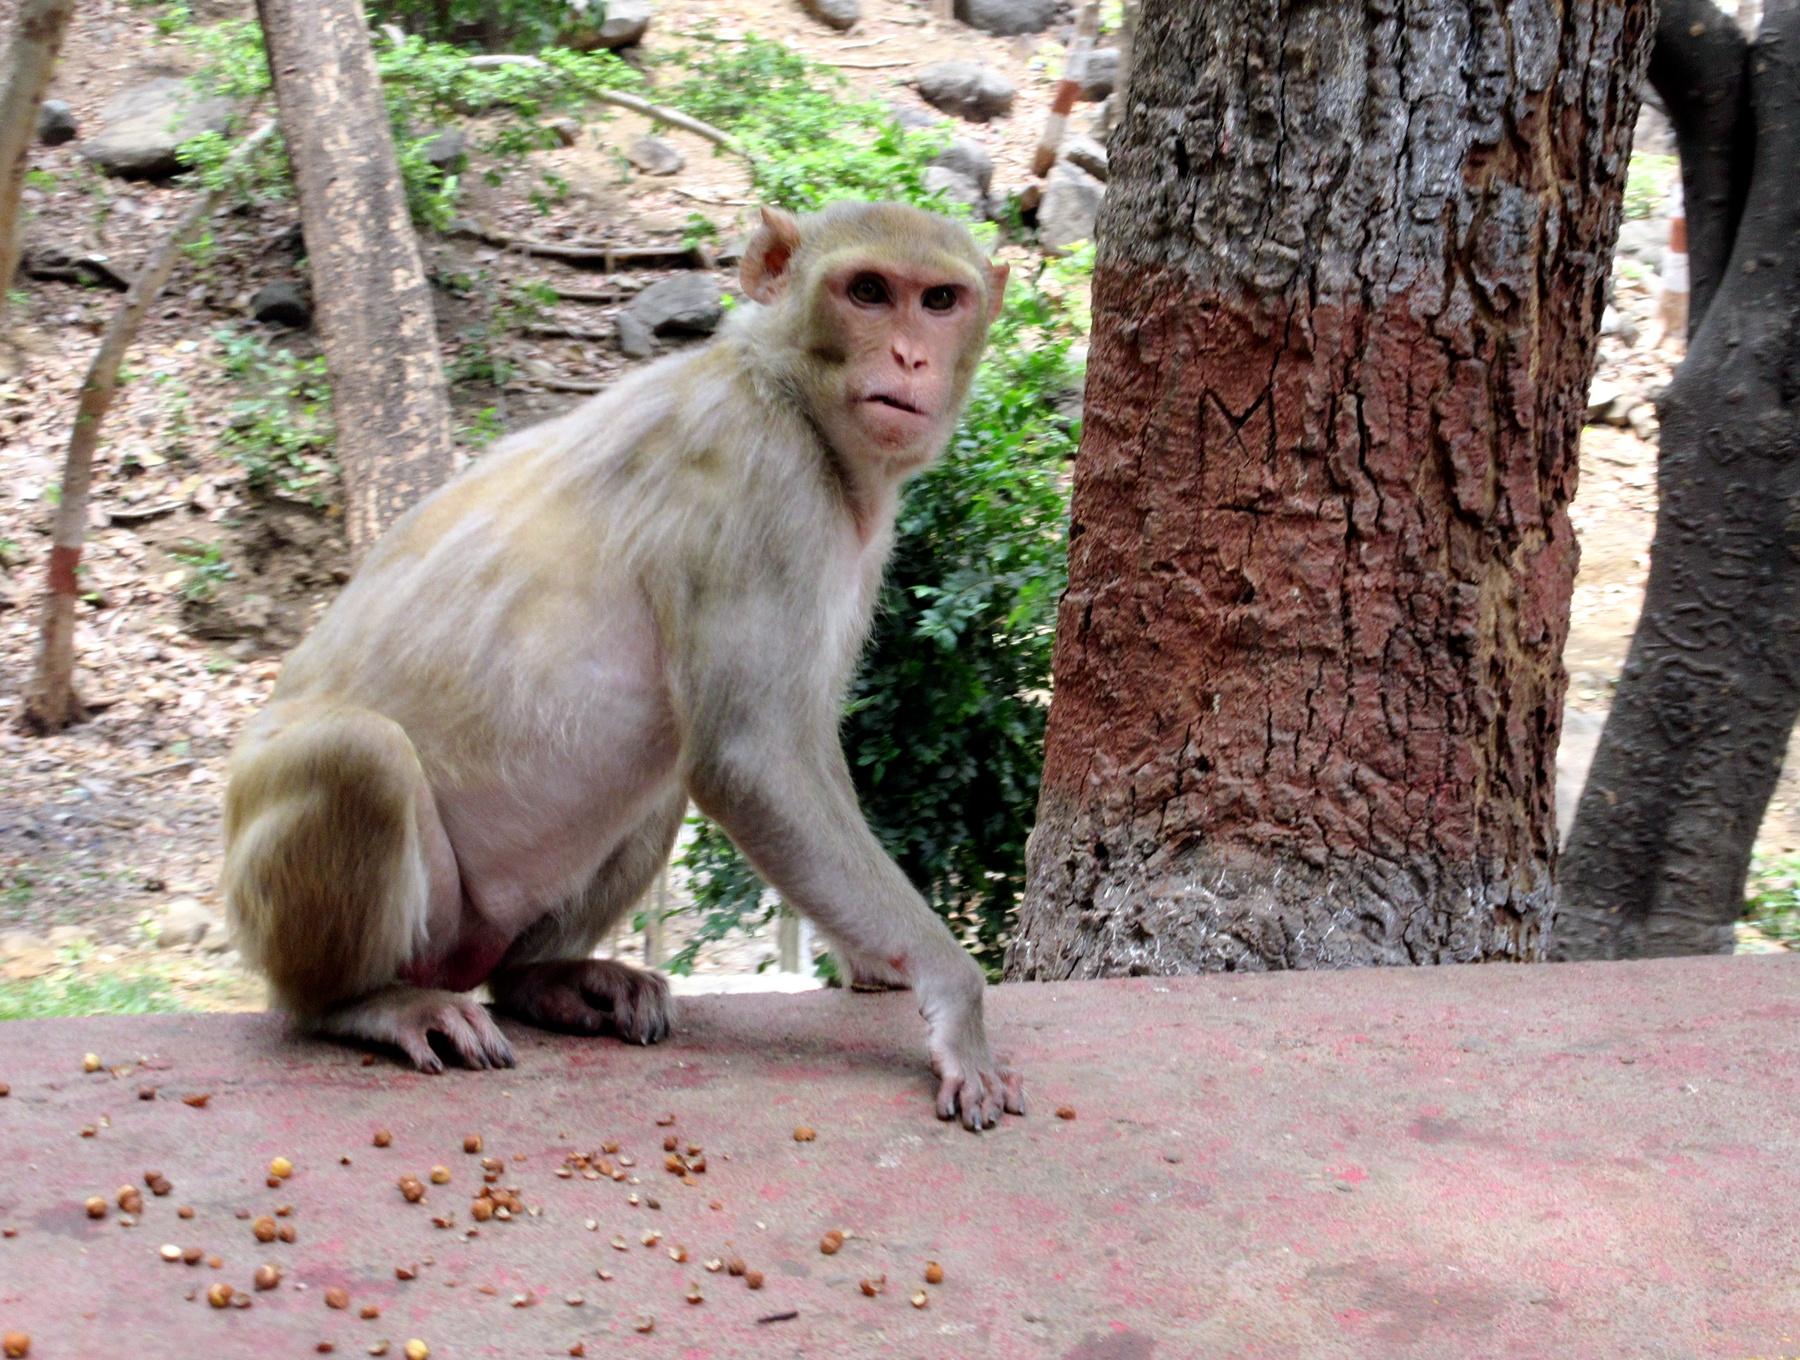 wicked monkey - animal life by TRAVEL WITH YOGI